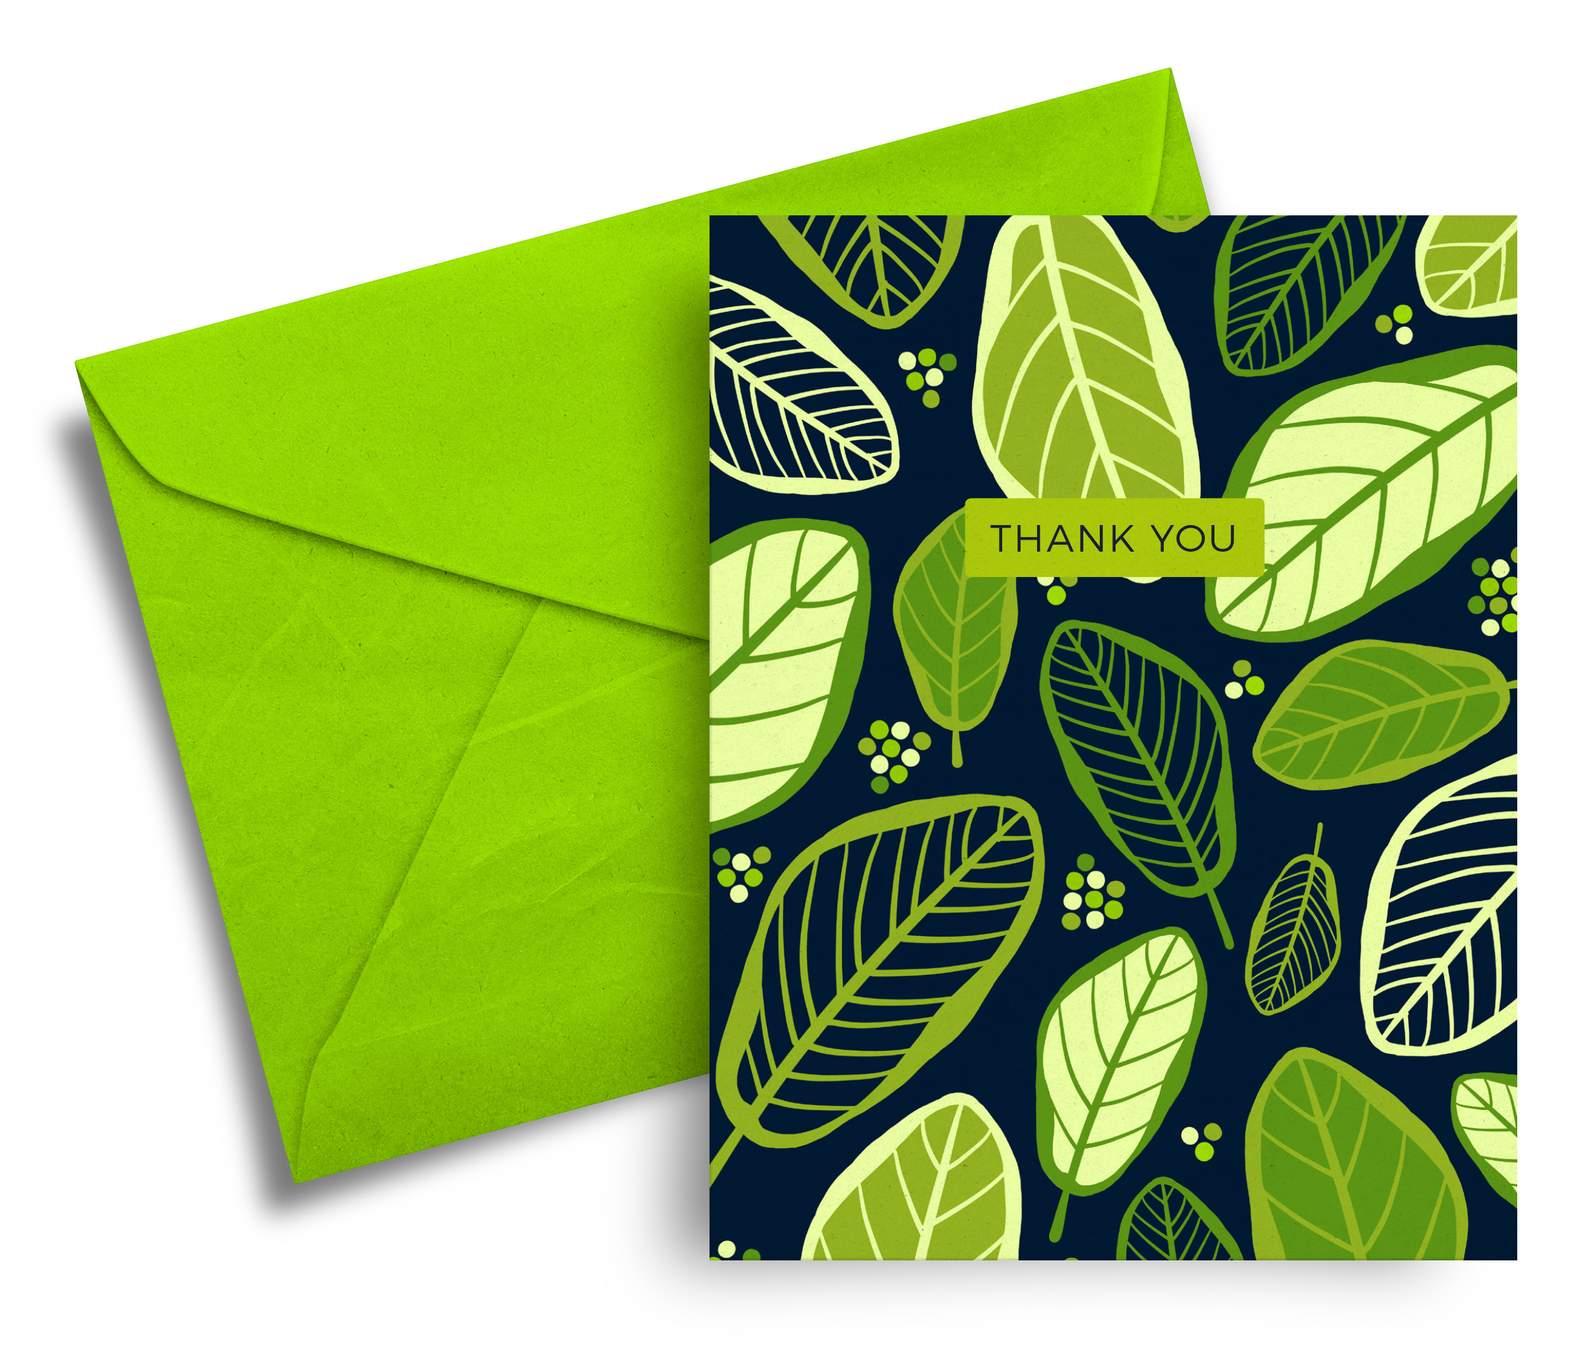 Thank You A6 Greeting Card Nz Flora And Fauna Felt